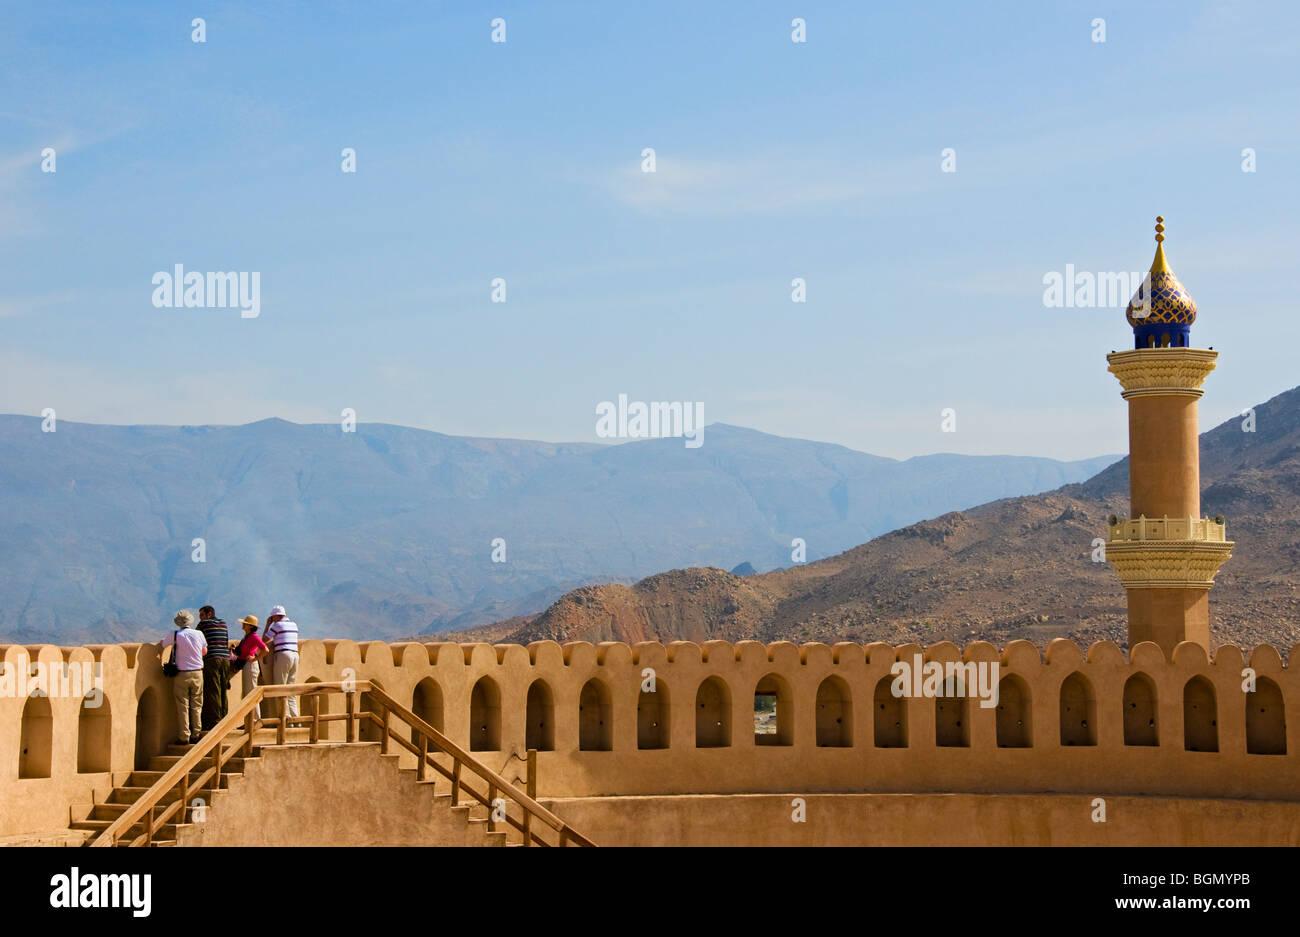 Nizwa fort Sultanate of Oman - Stock Image